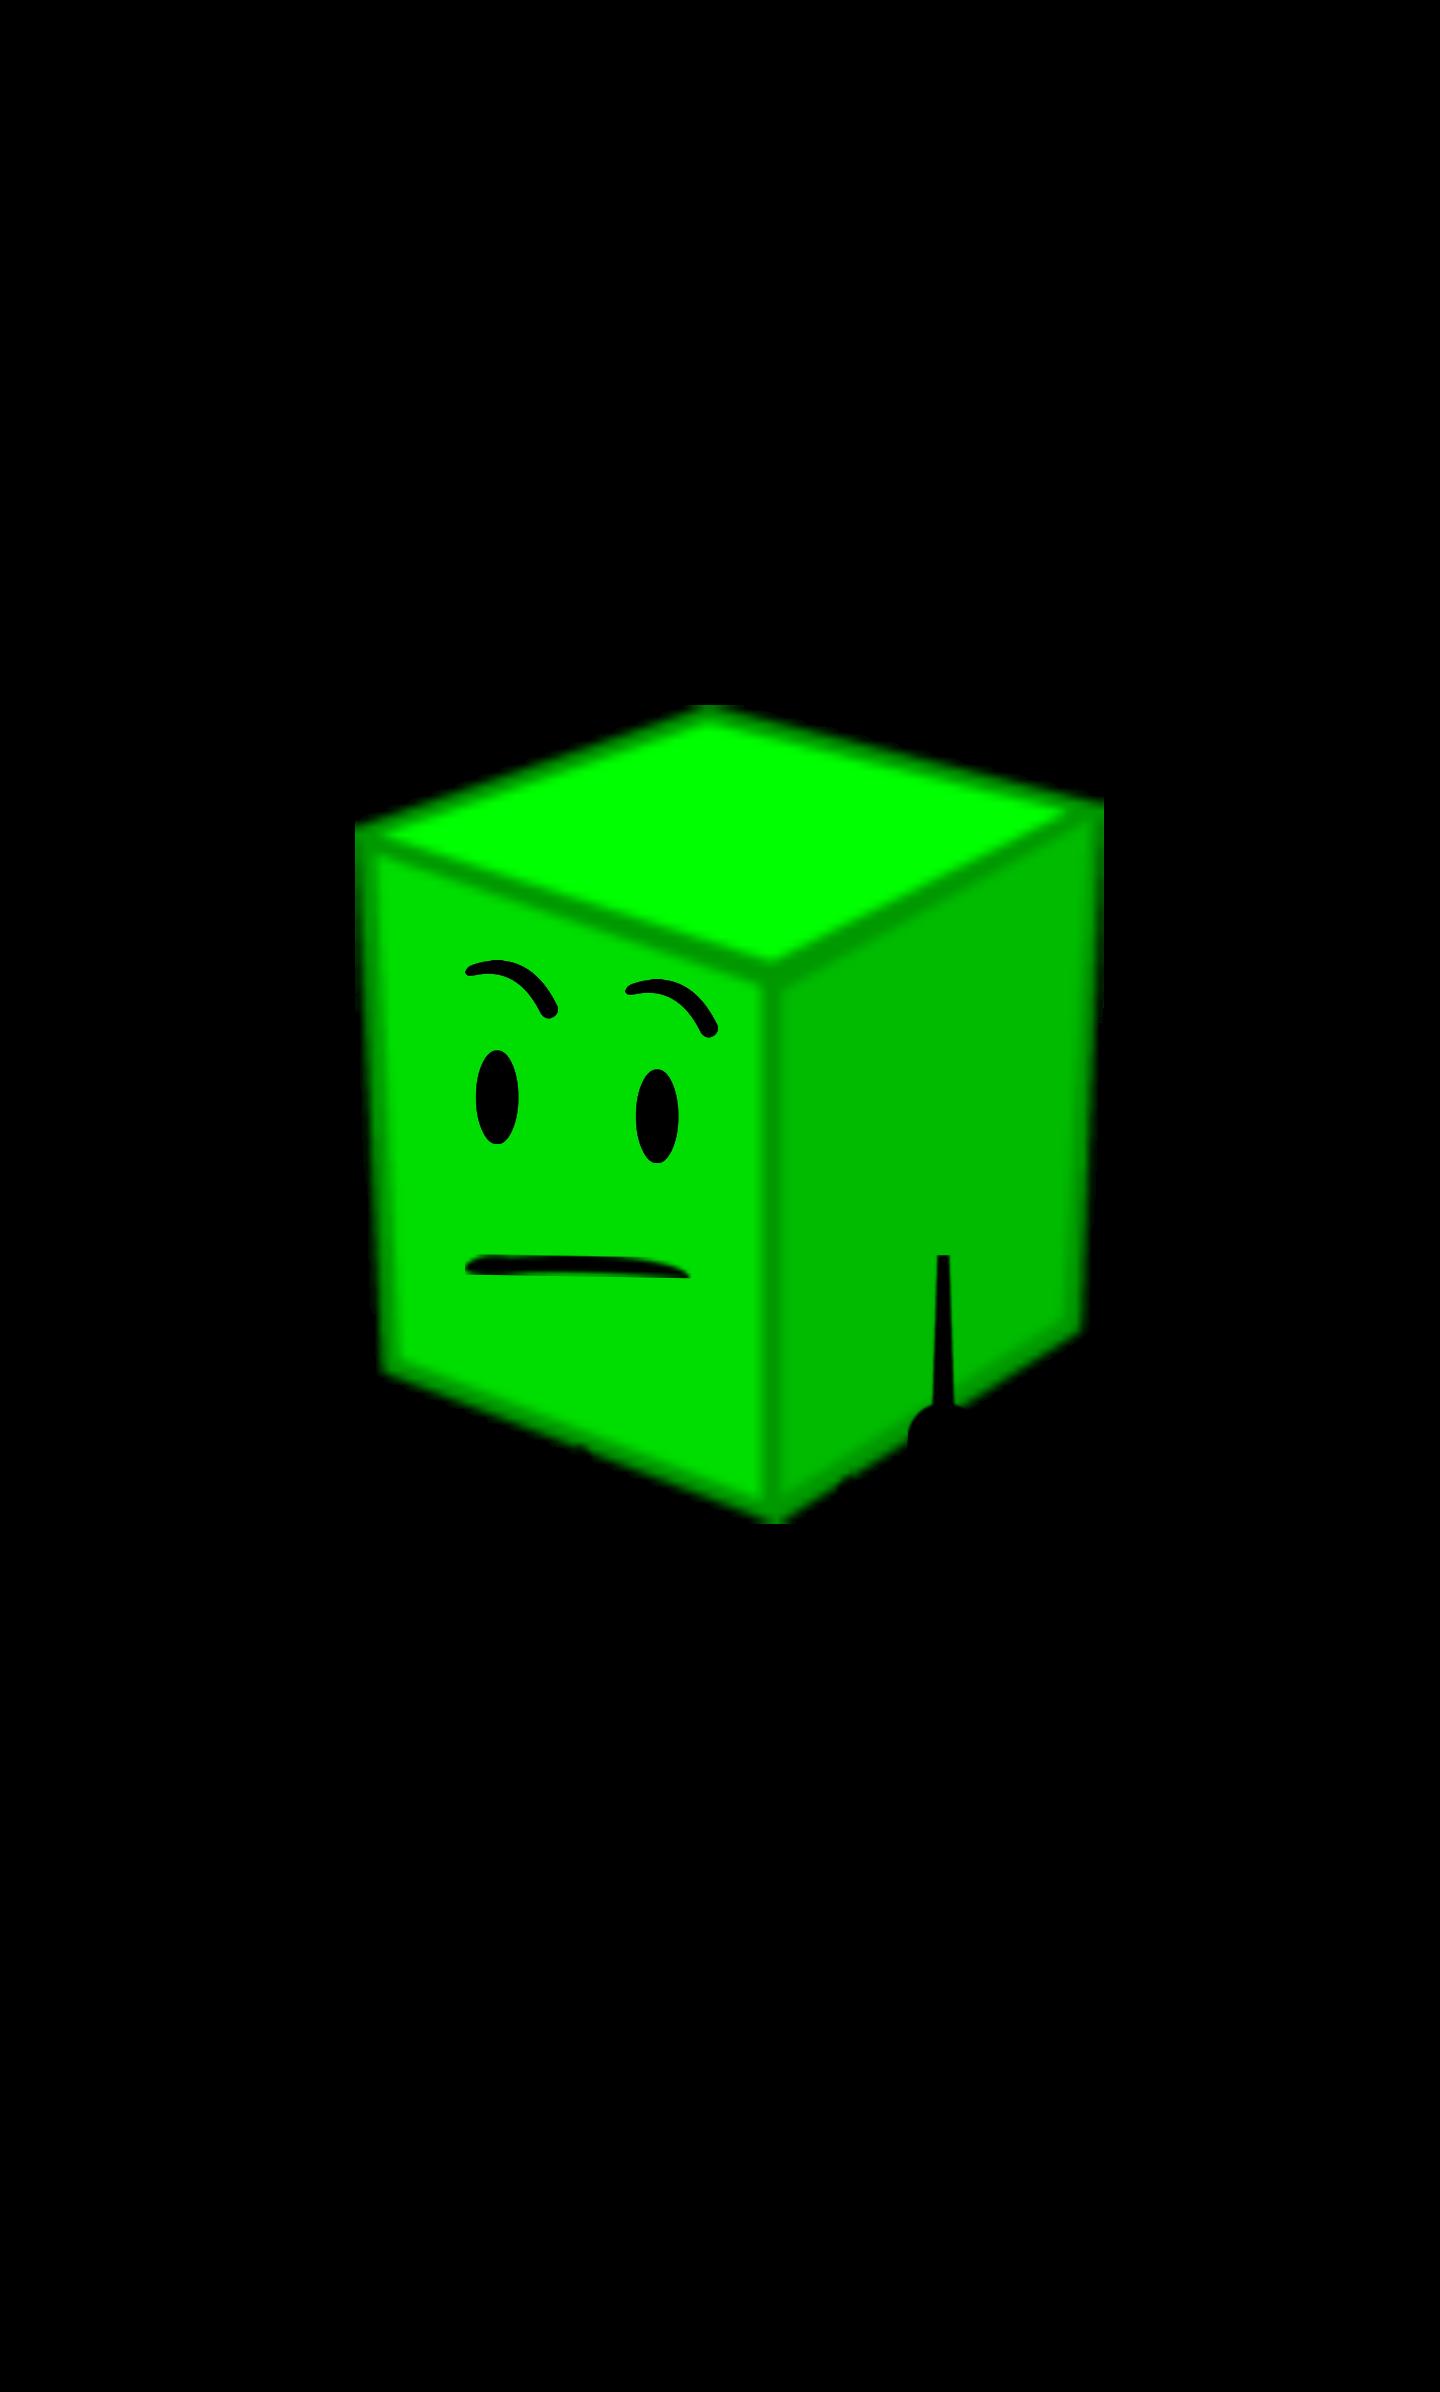 Green Blocky